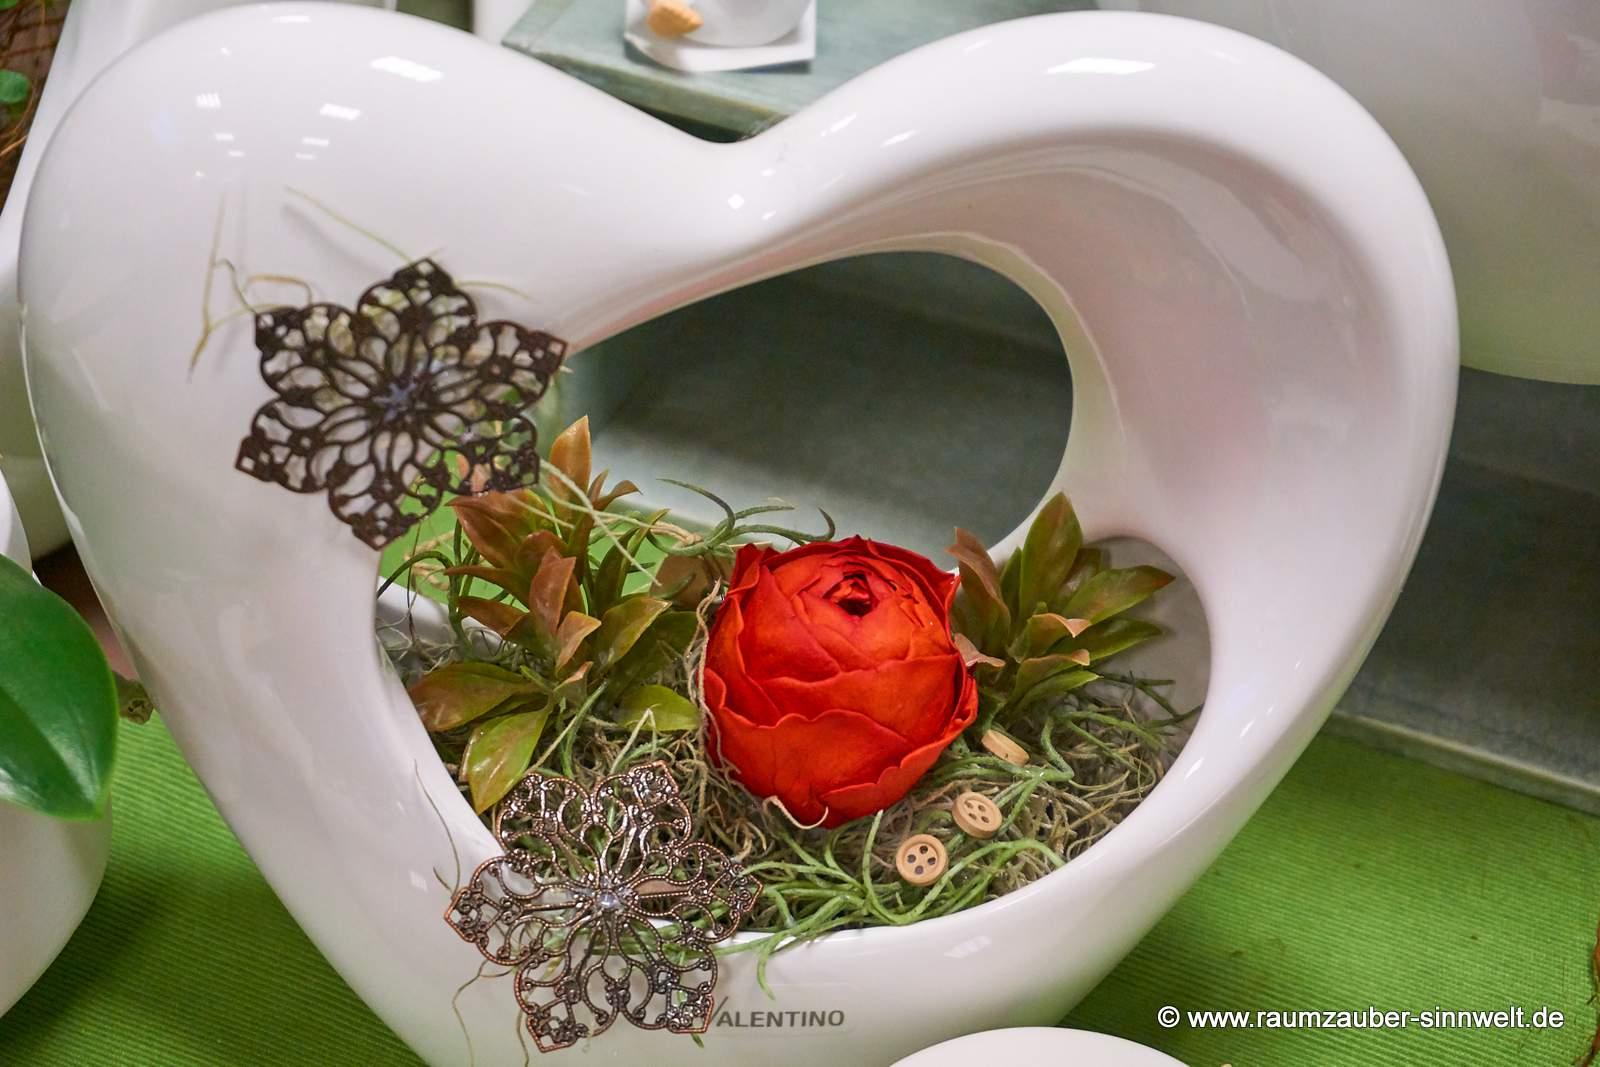 gefriergetrocknete Ranunkel-Rose in TIZIANO-Keramik